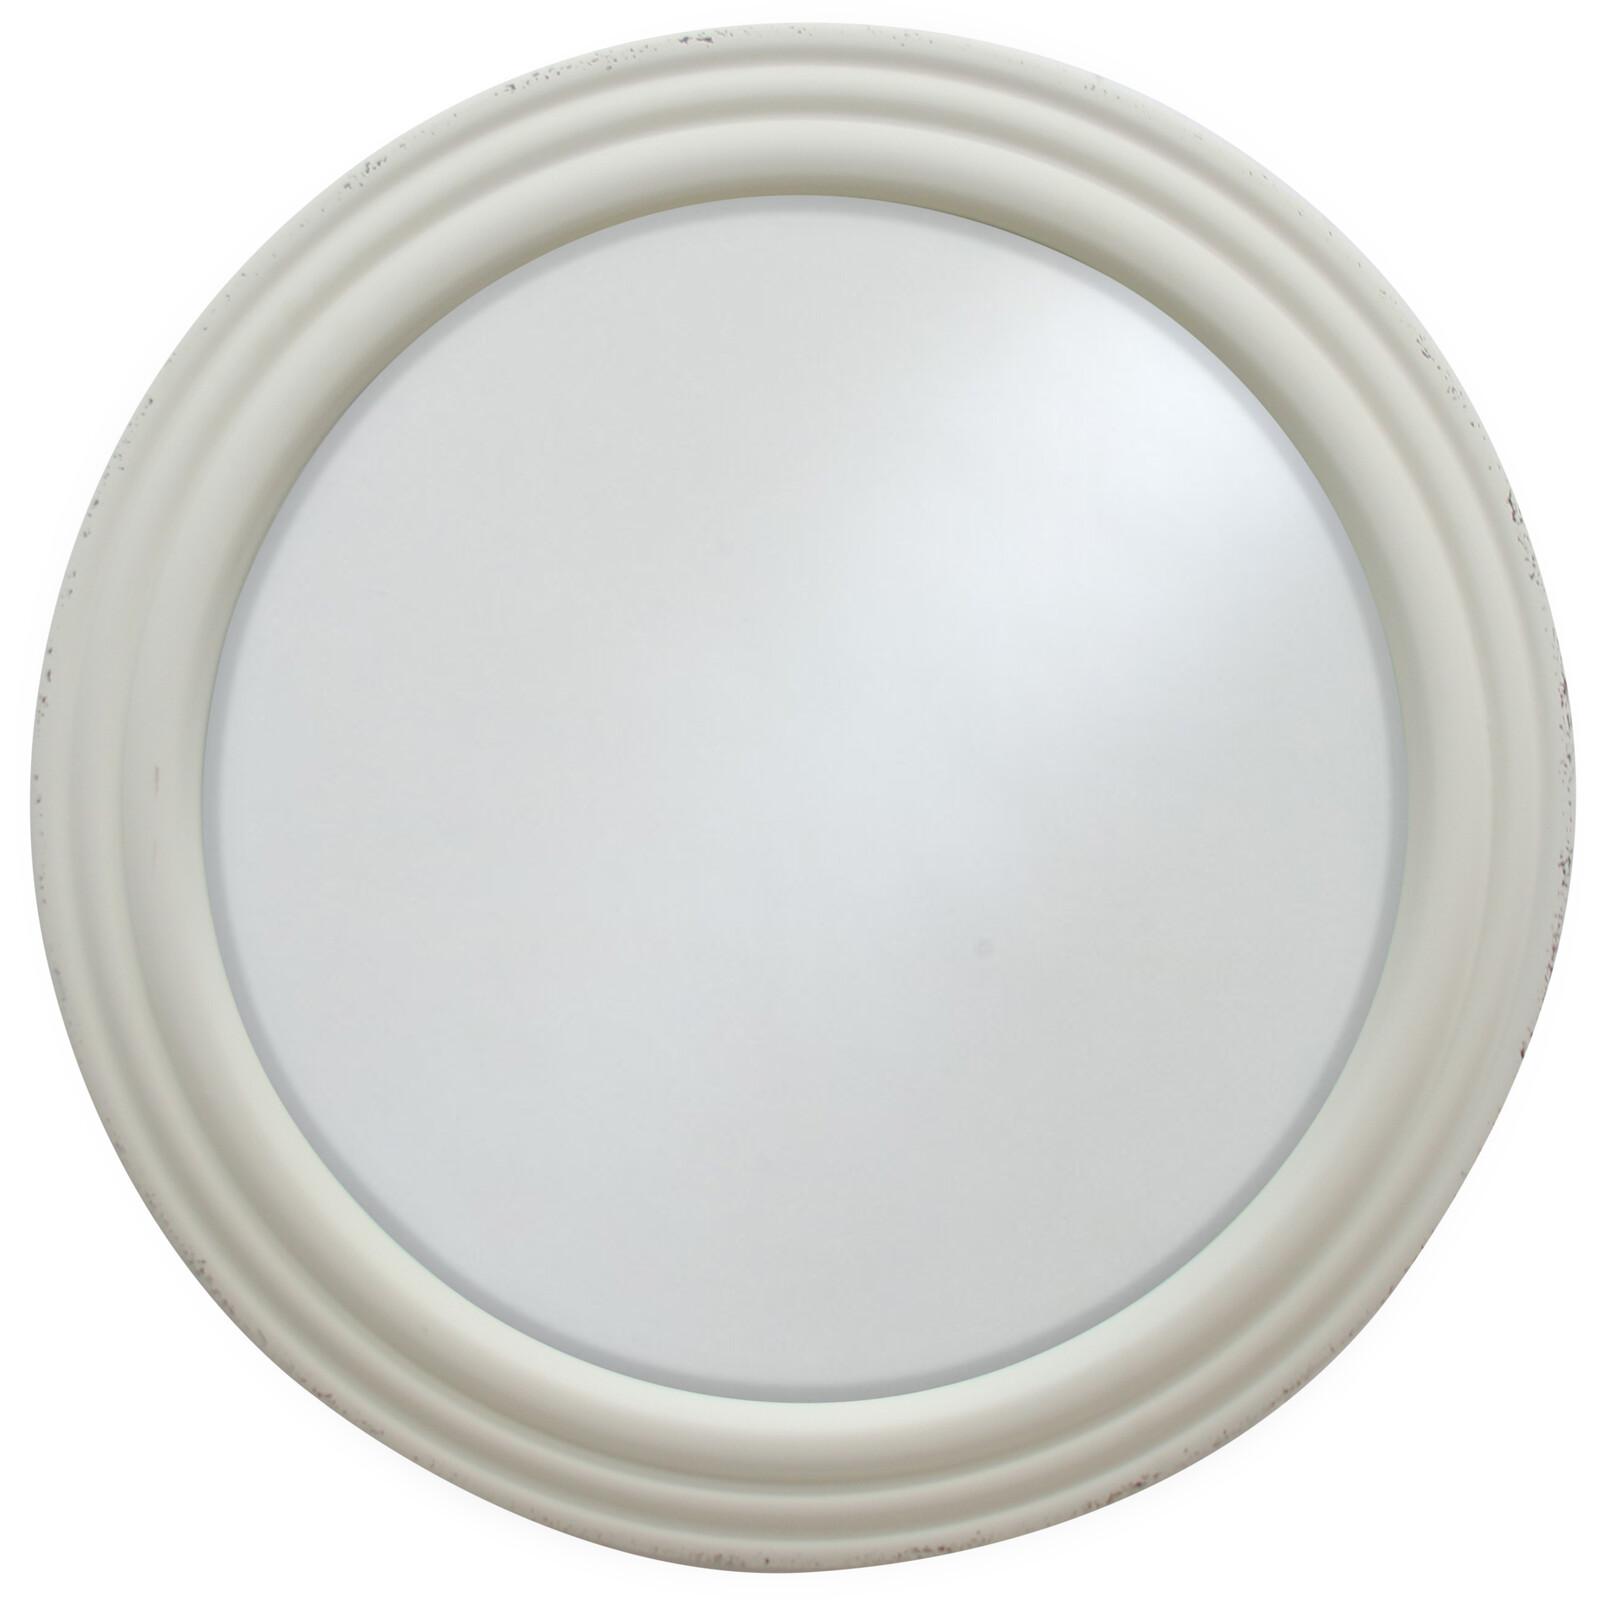 Mirror Orlo Round